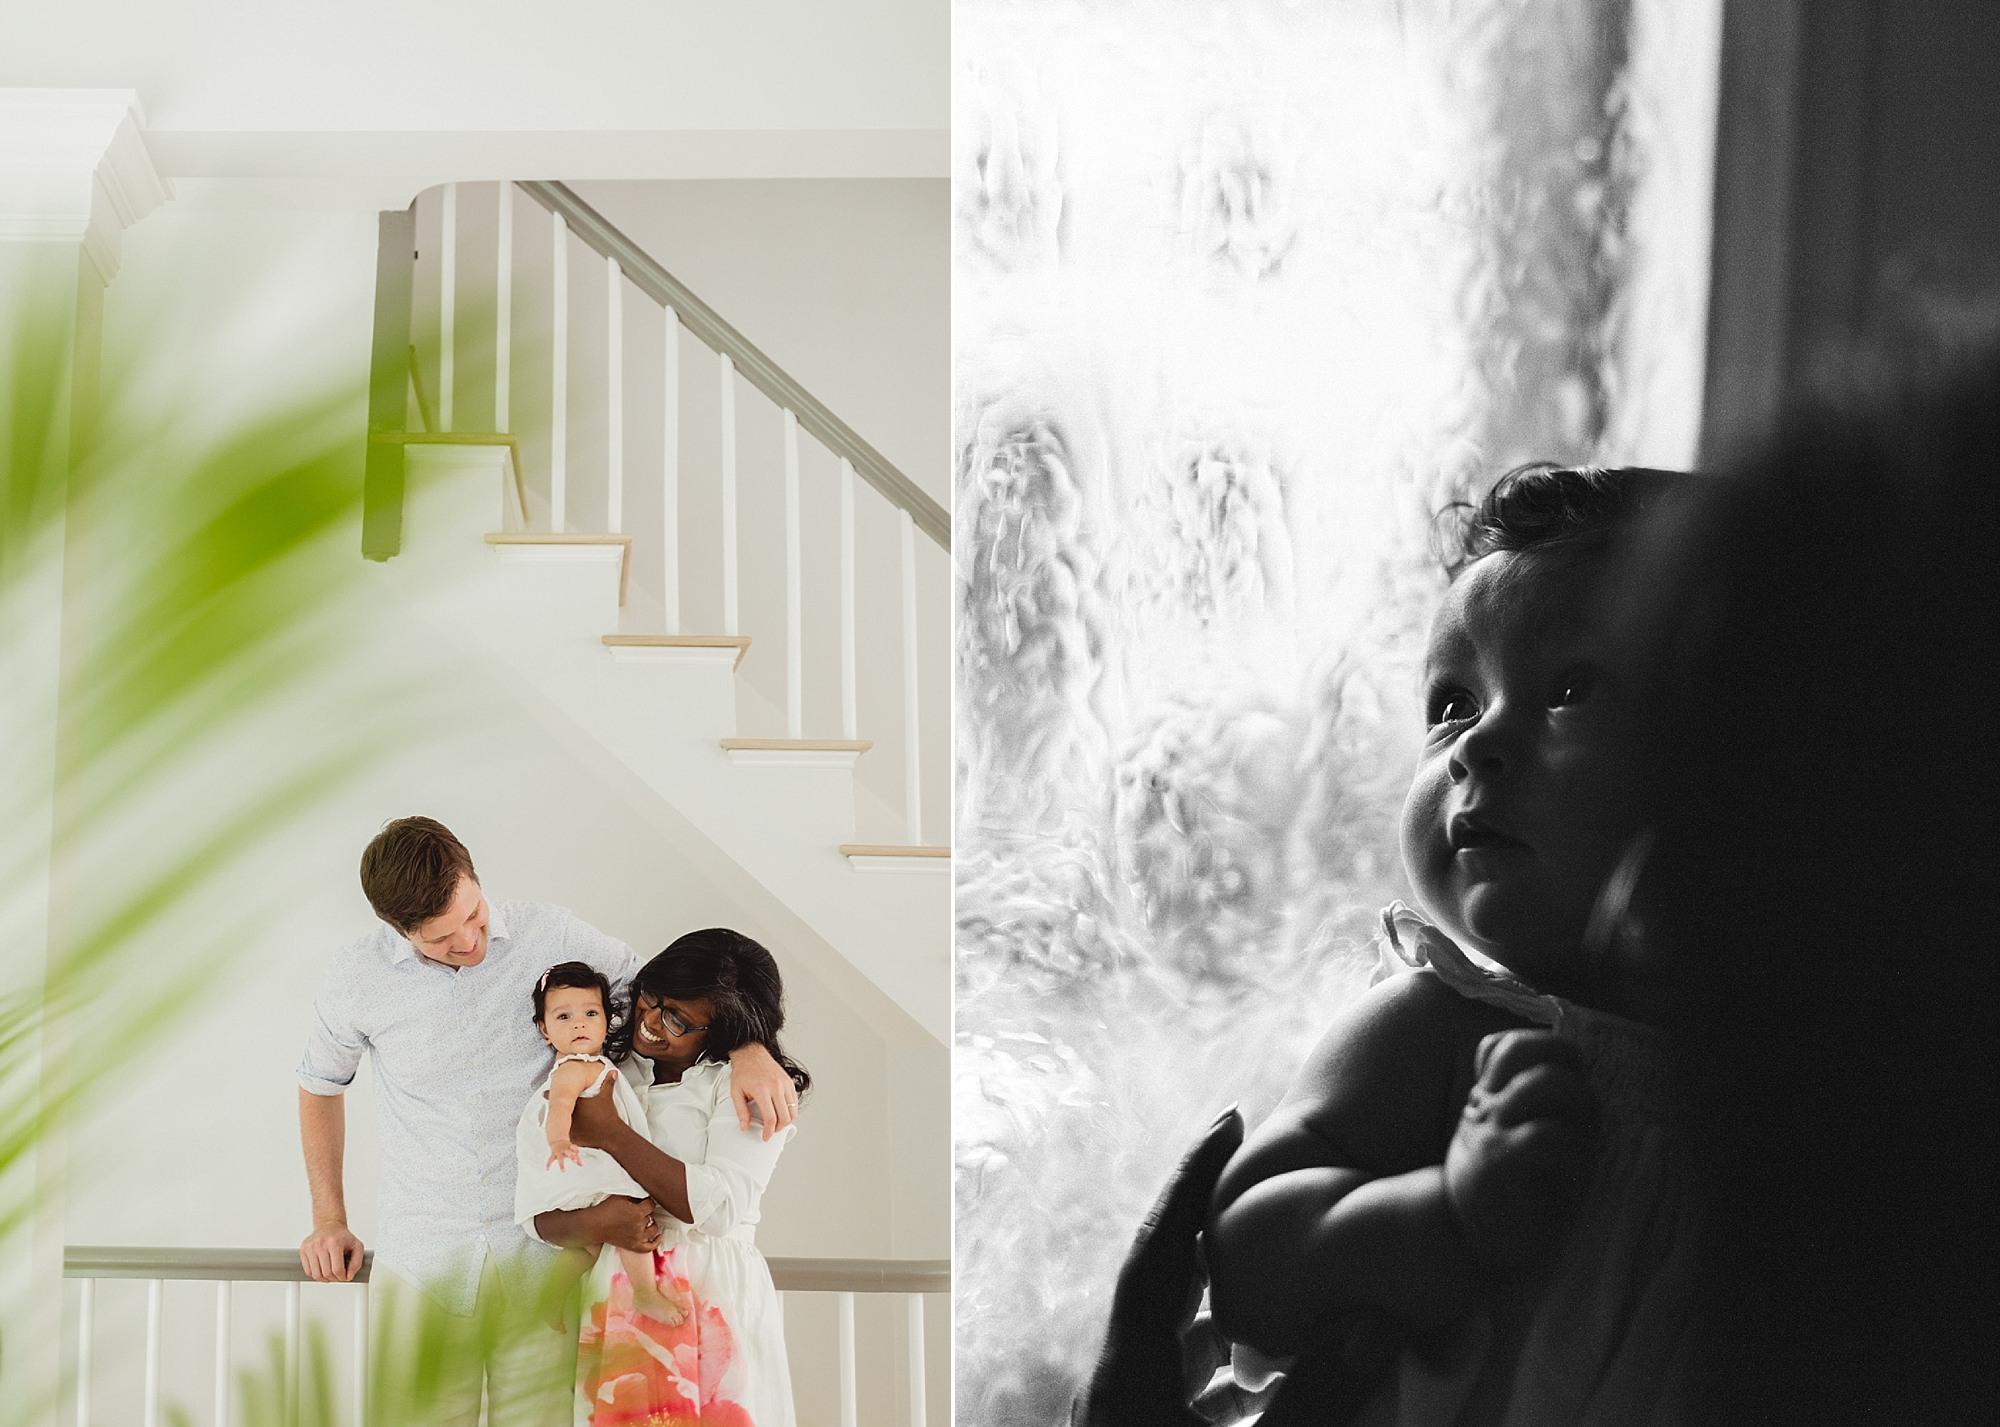 Family photography - Boston-15-2.jpg